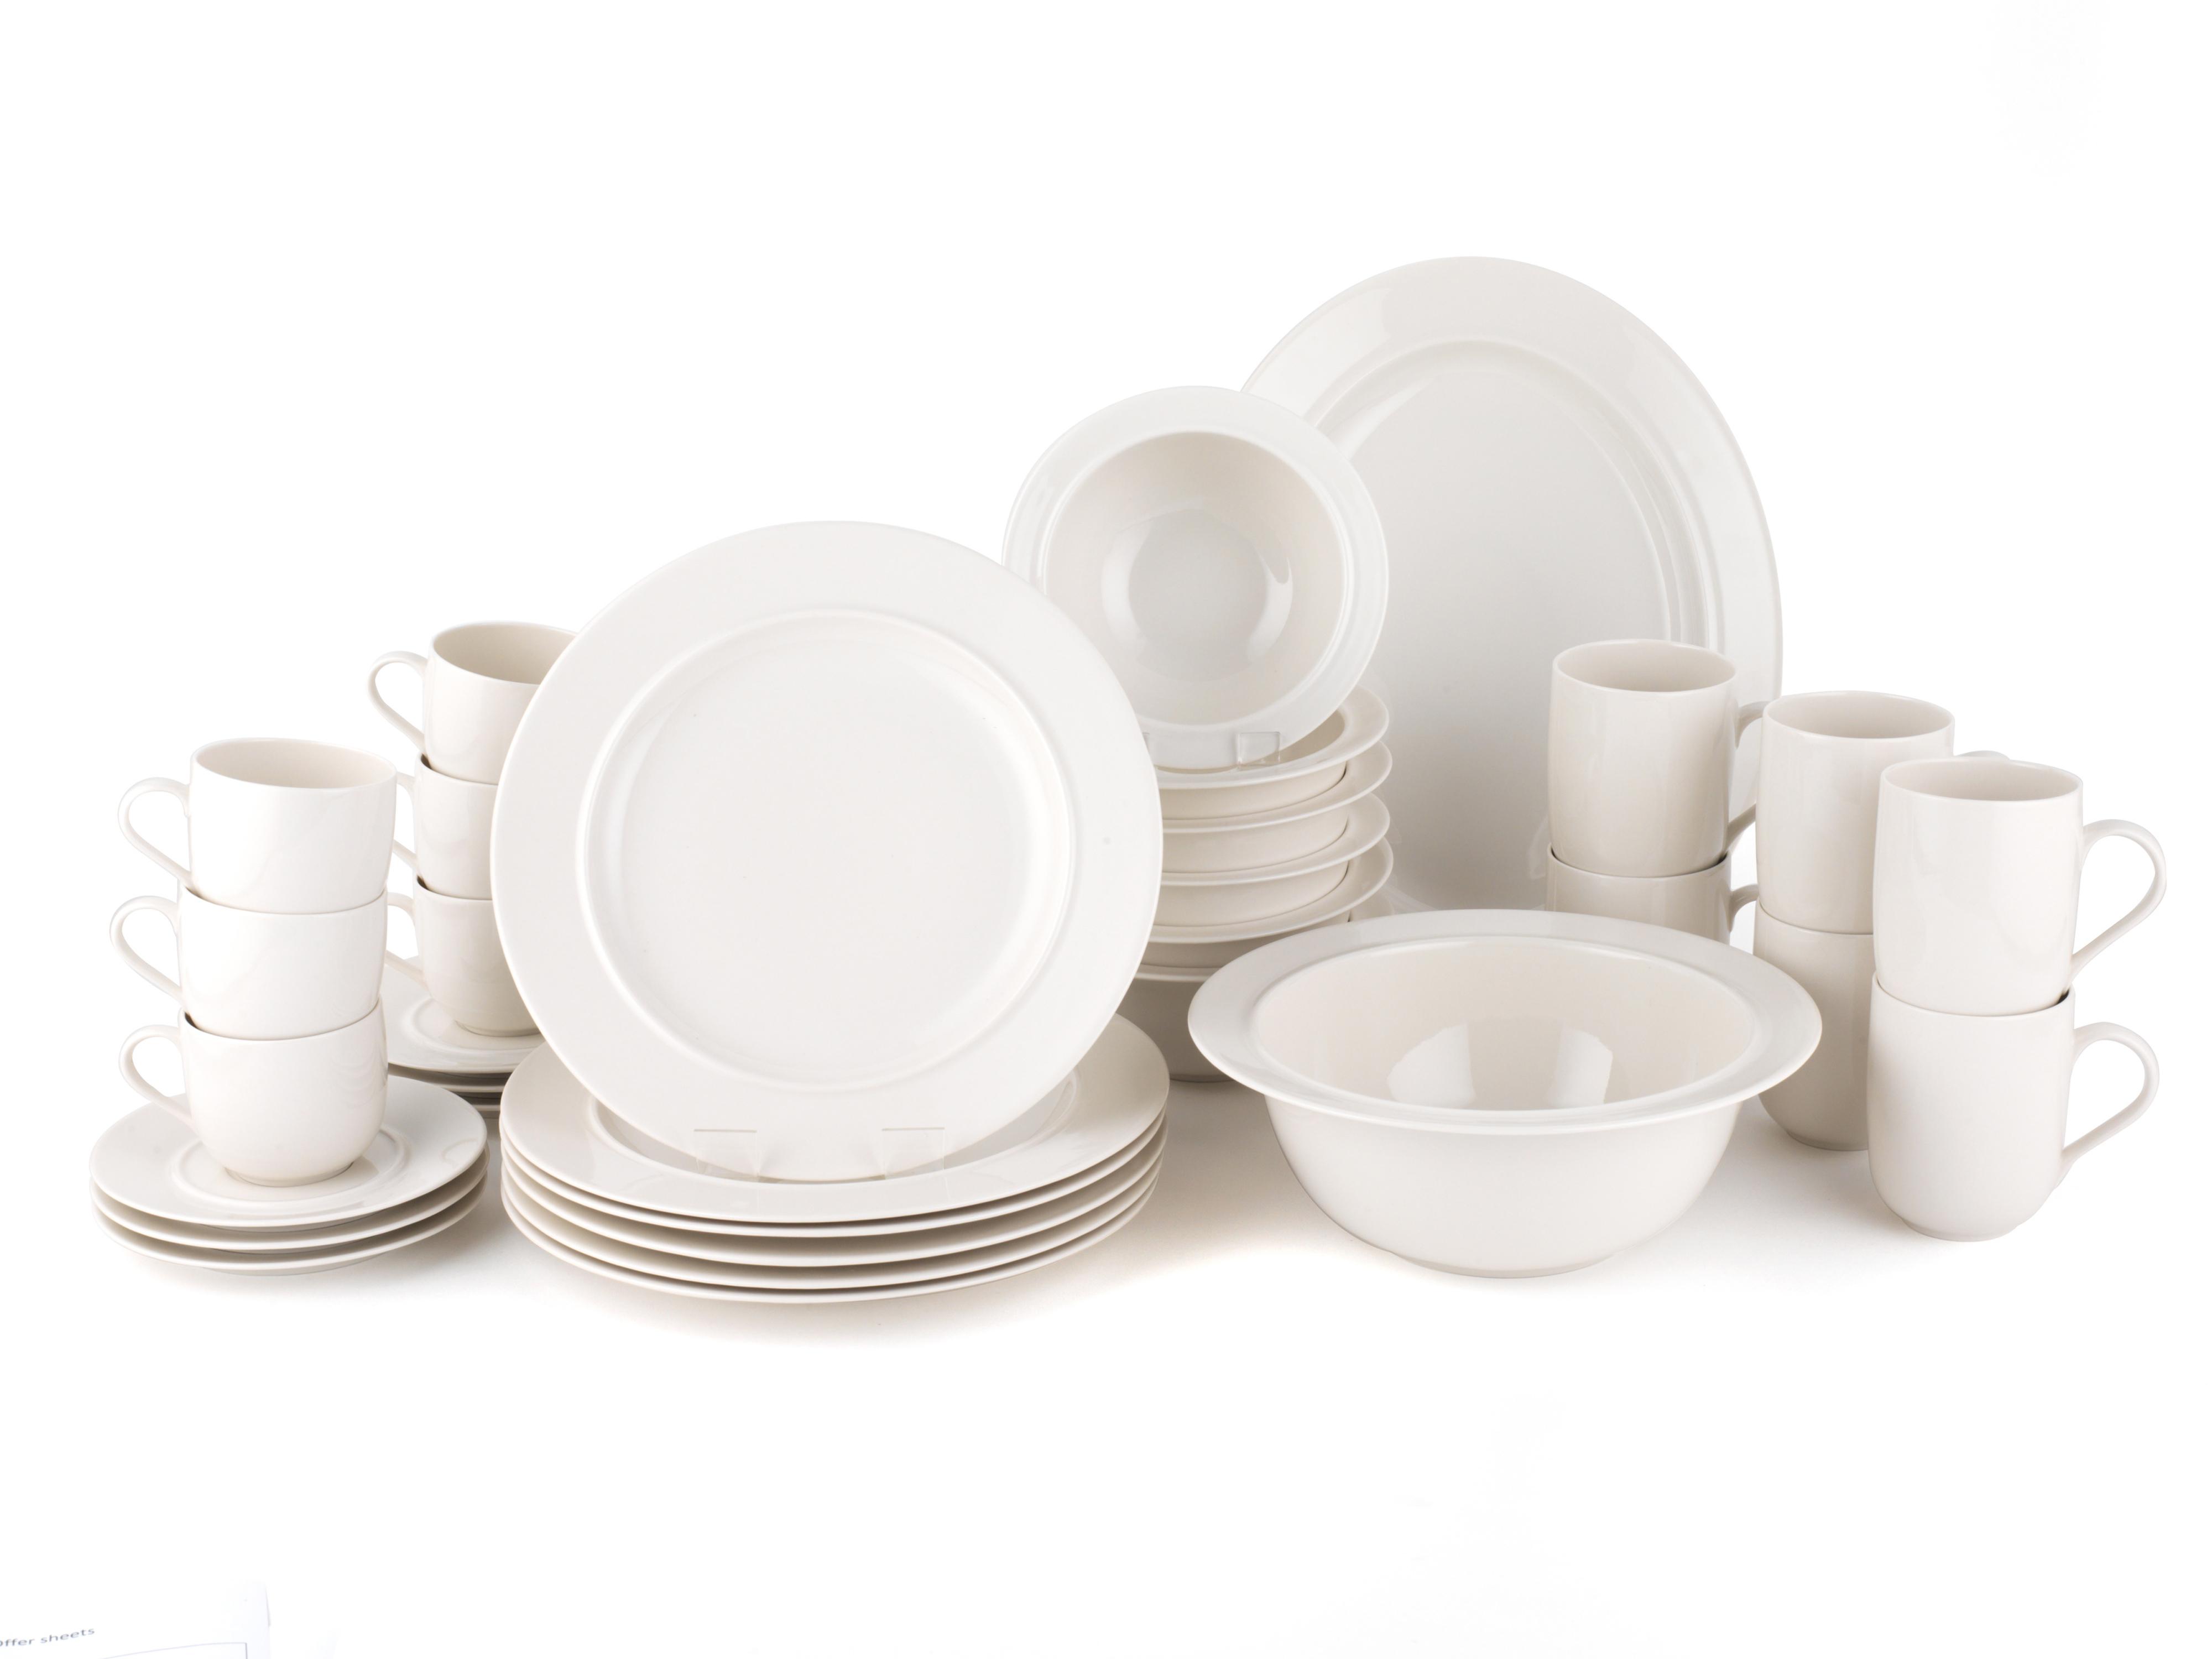 Alessi la bella tavola porcelain 6 place setting dining - Alessi dinnerware sets ...